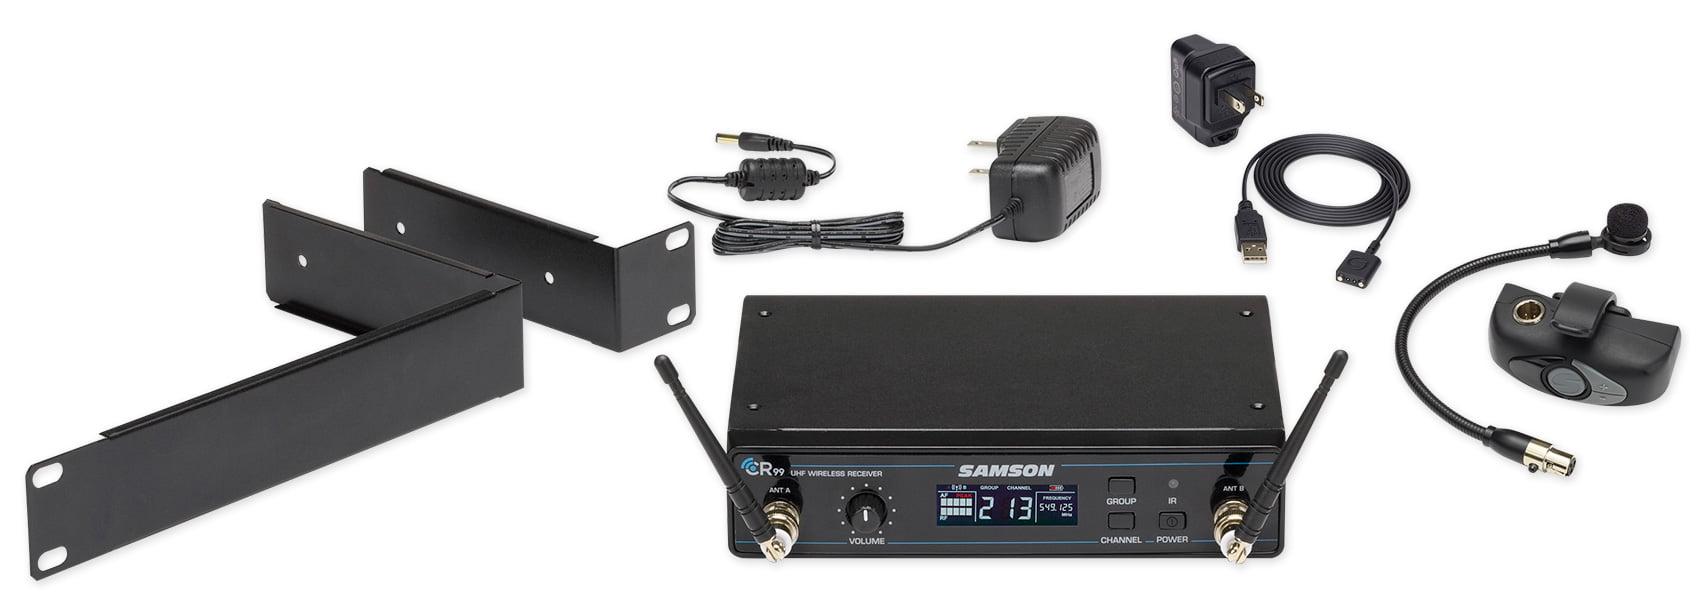 SAMSON AirLine AWX Wind Instrument Wireless Horn Microphone Mic 470�494 MHz by Samson